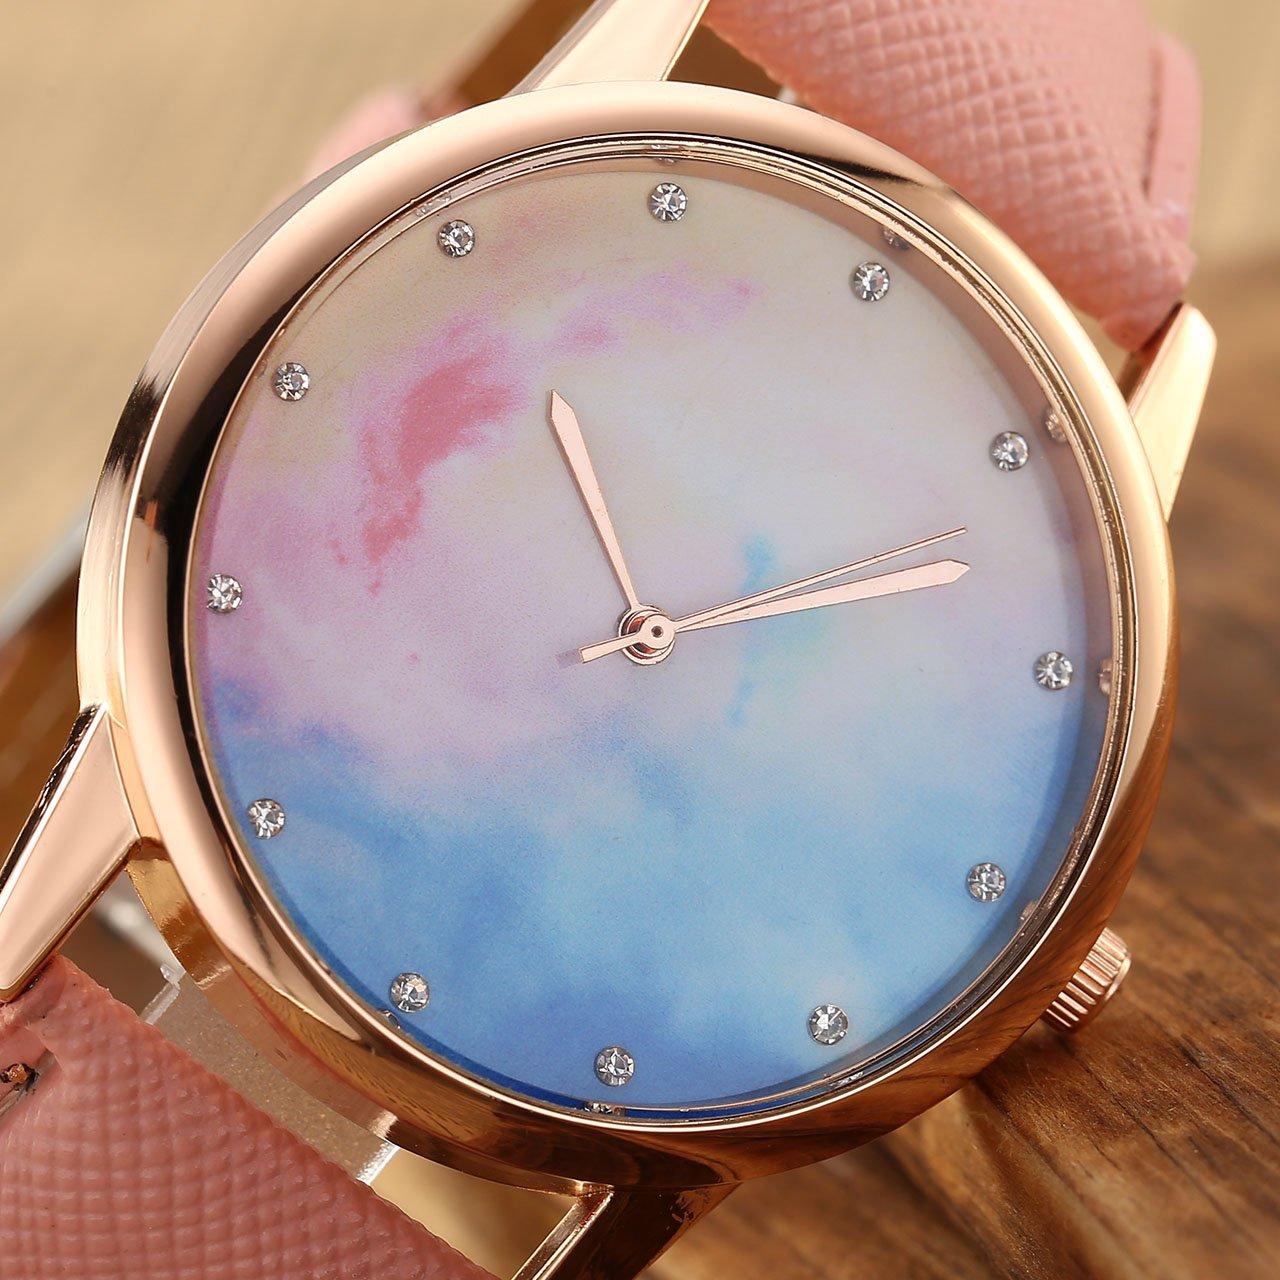 JSDDE Uhren,Fashion Cute Candy Farbe Damen Armbanduhr Sternenhimmel Farbverlauf Kleid Uhren PU Lederband Quarz Uhr,Pink